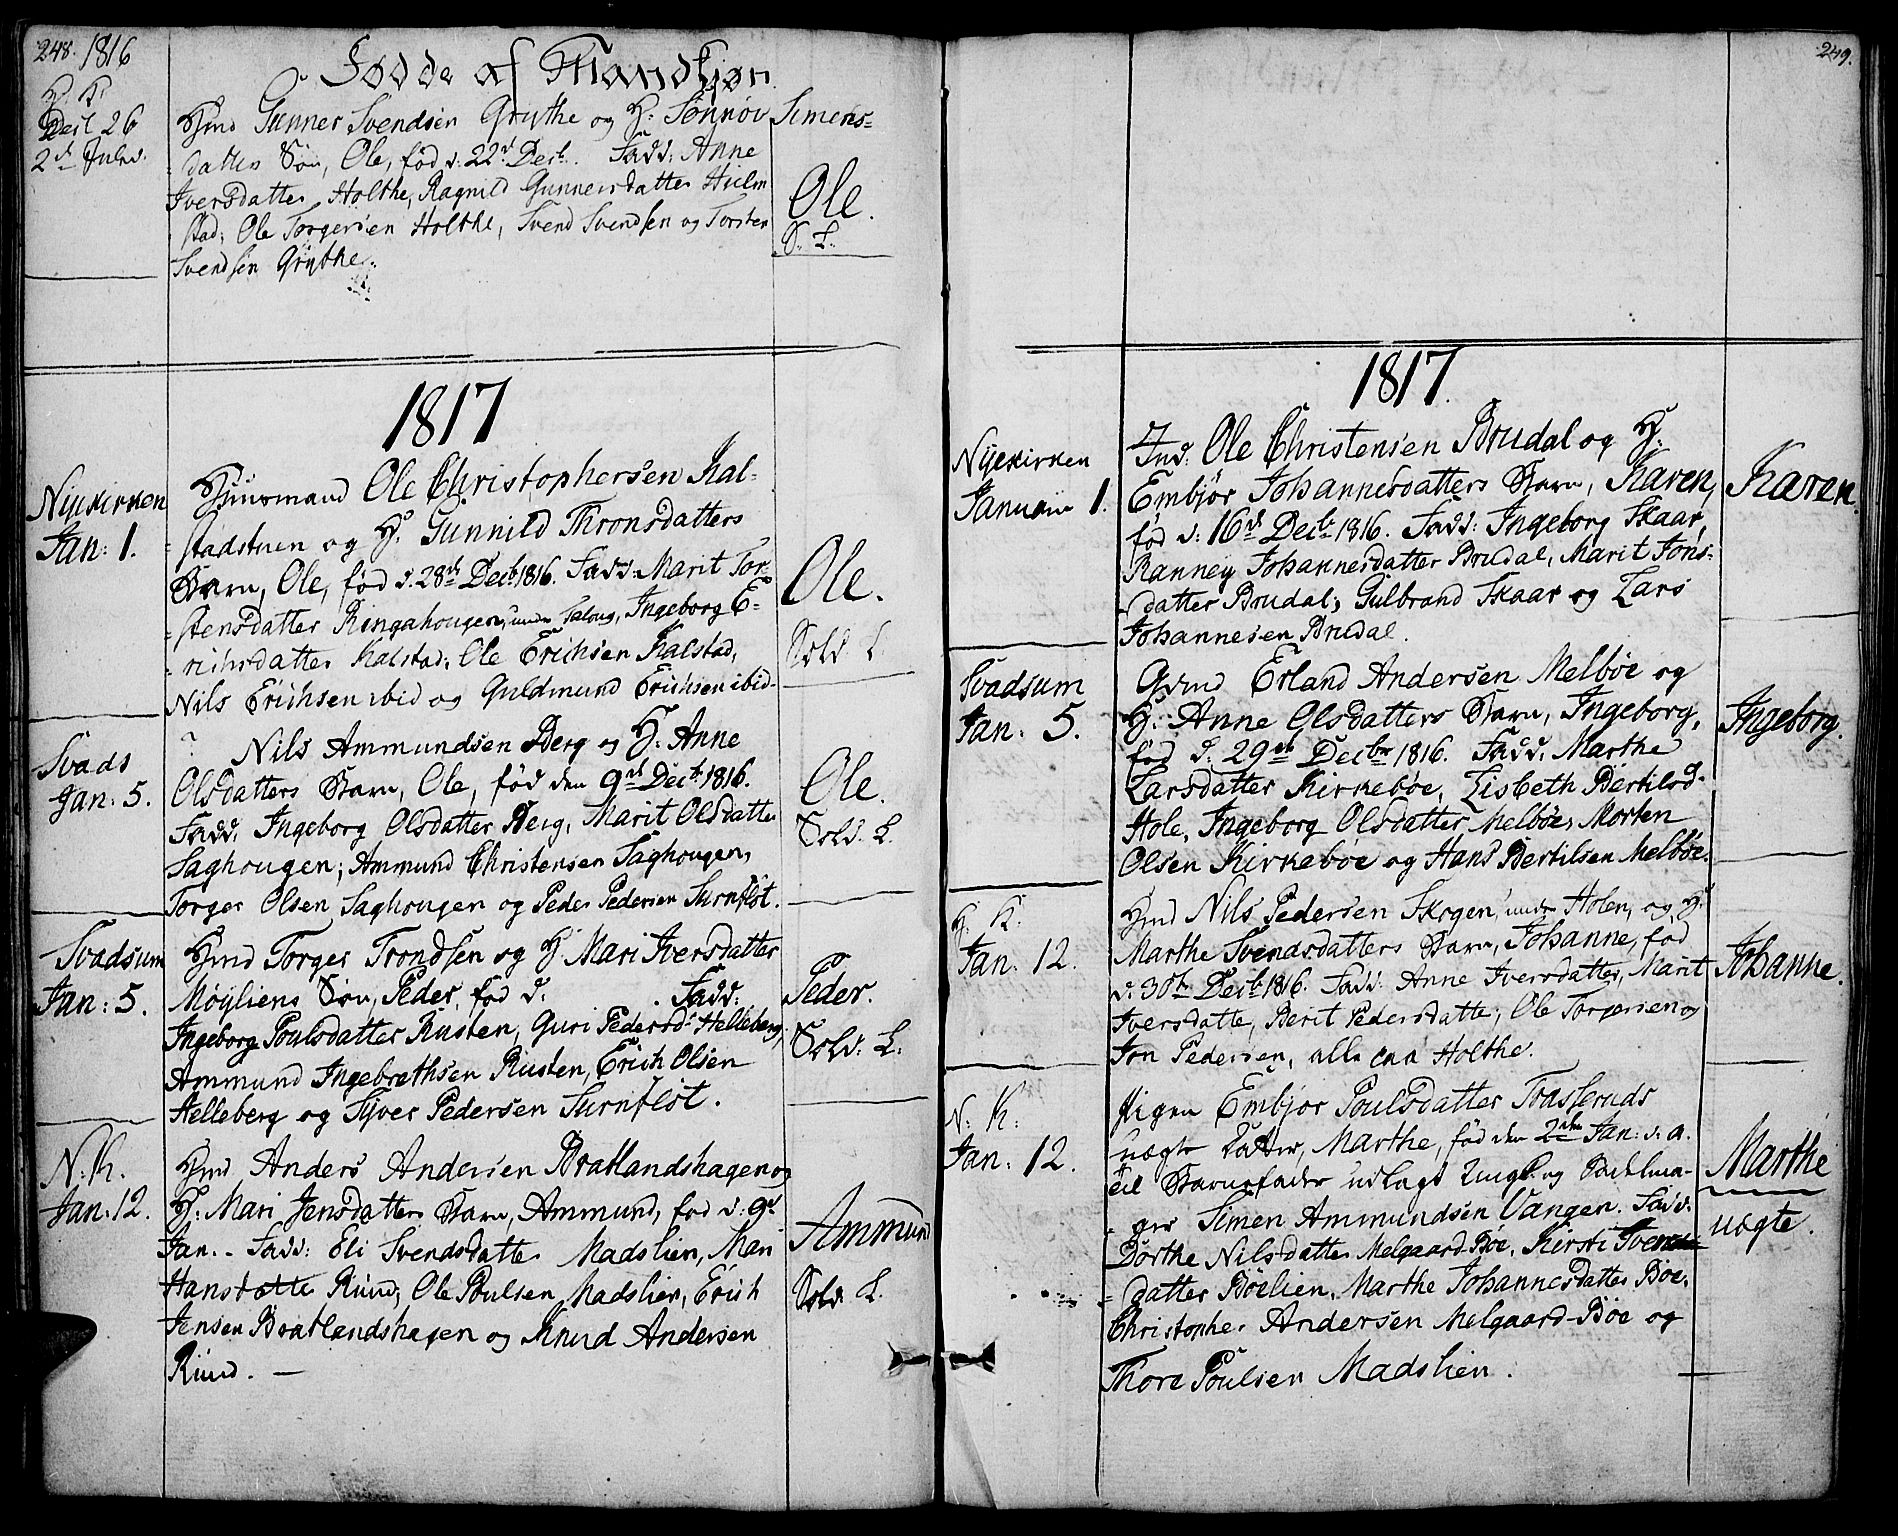 SAH, Gausdal prestekontor, Ministerialbok nr. 4, 1809-1817, s. 248-249